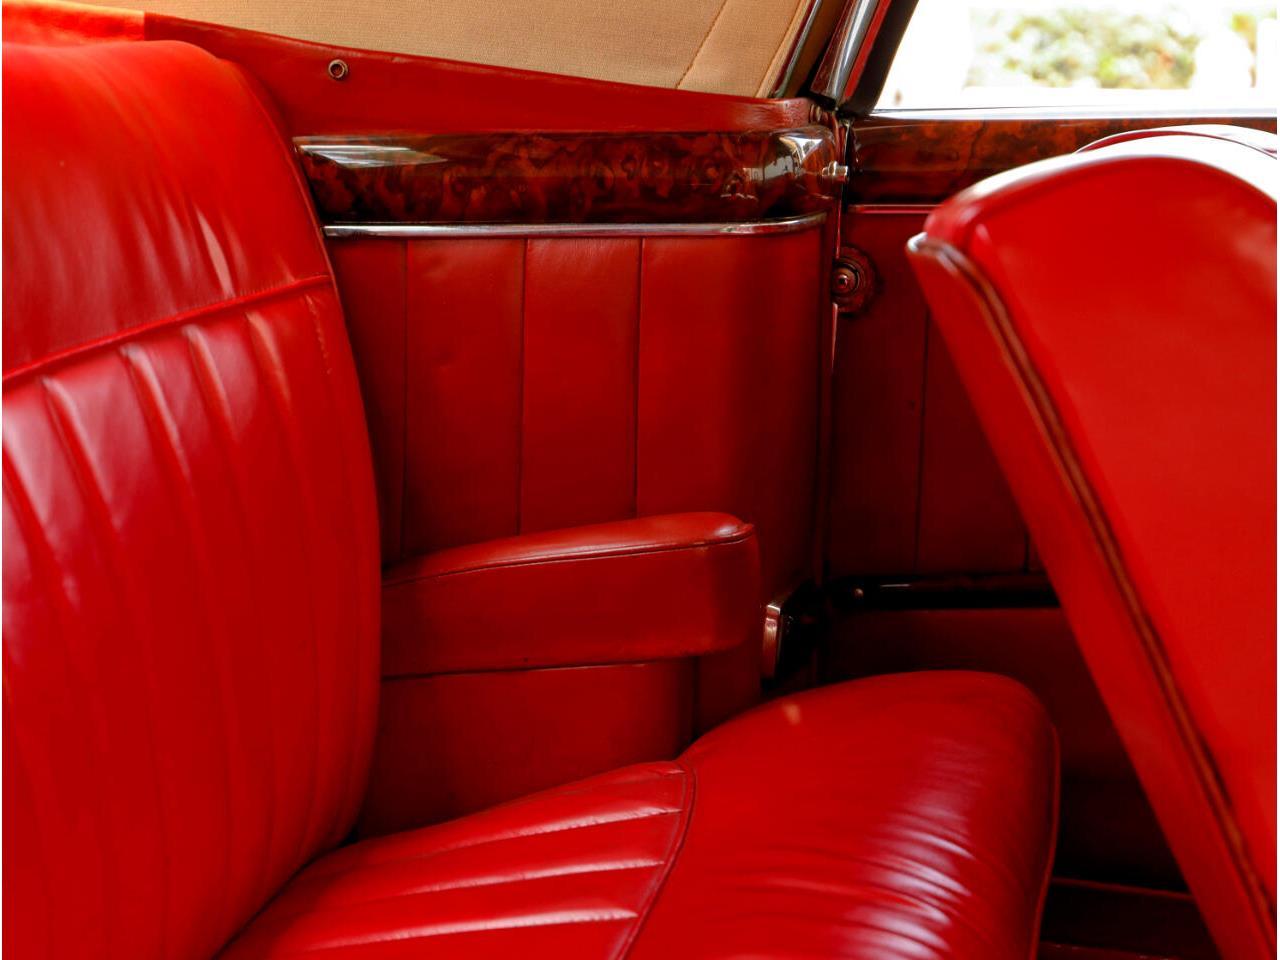 1956 Mercedes-Benz 220 (CC-1243123) for sale in Marina Del Rey, California